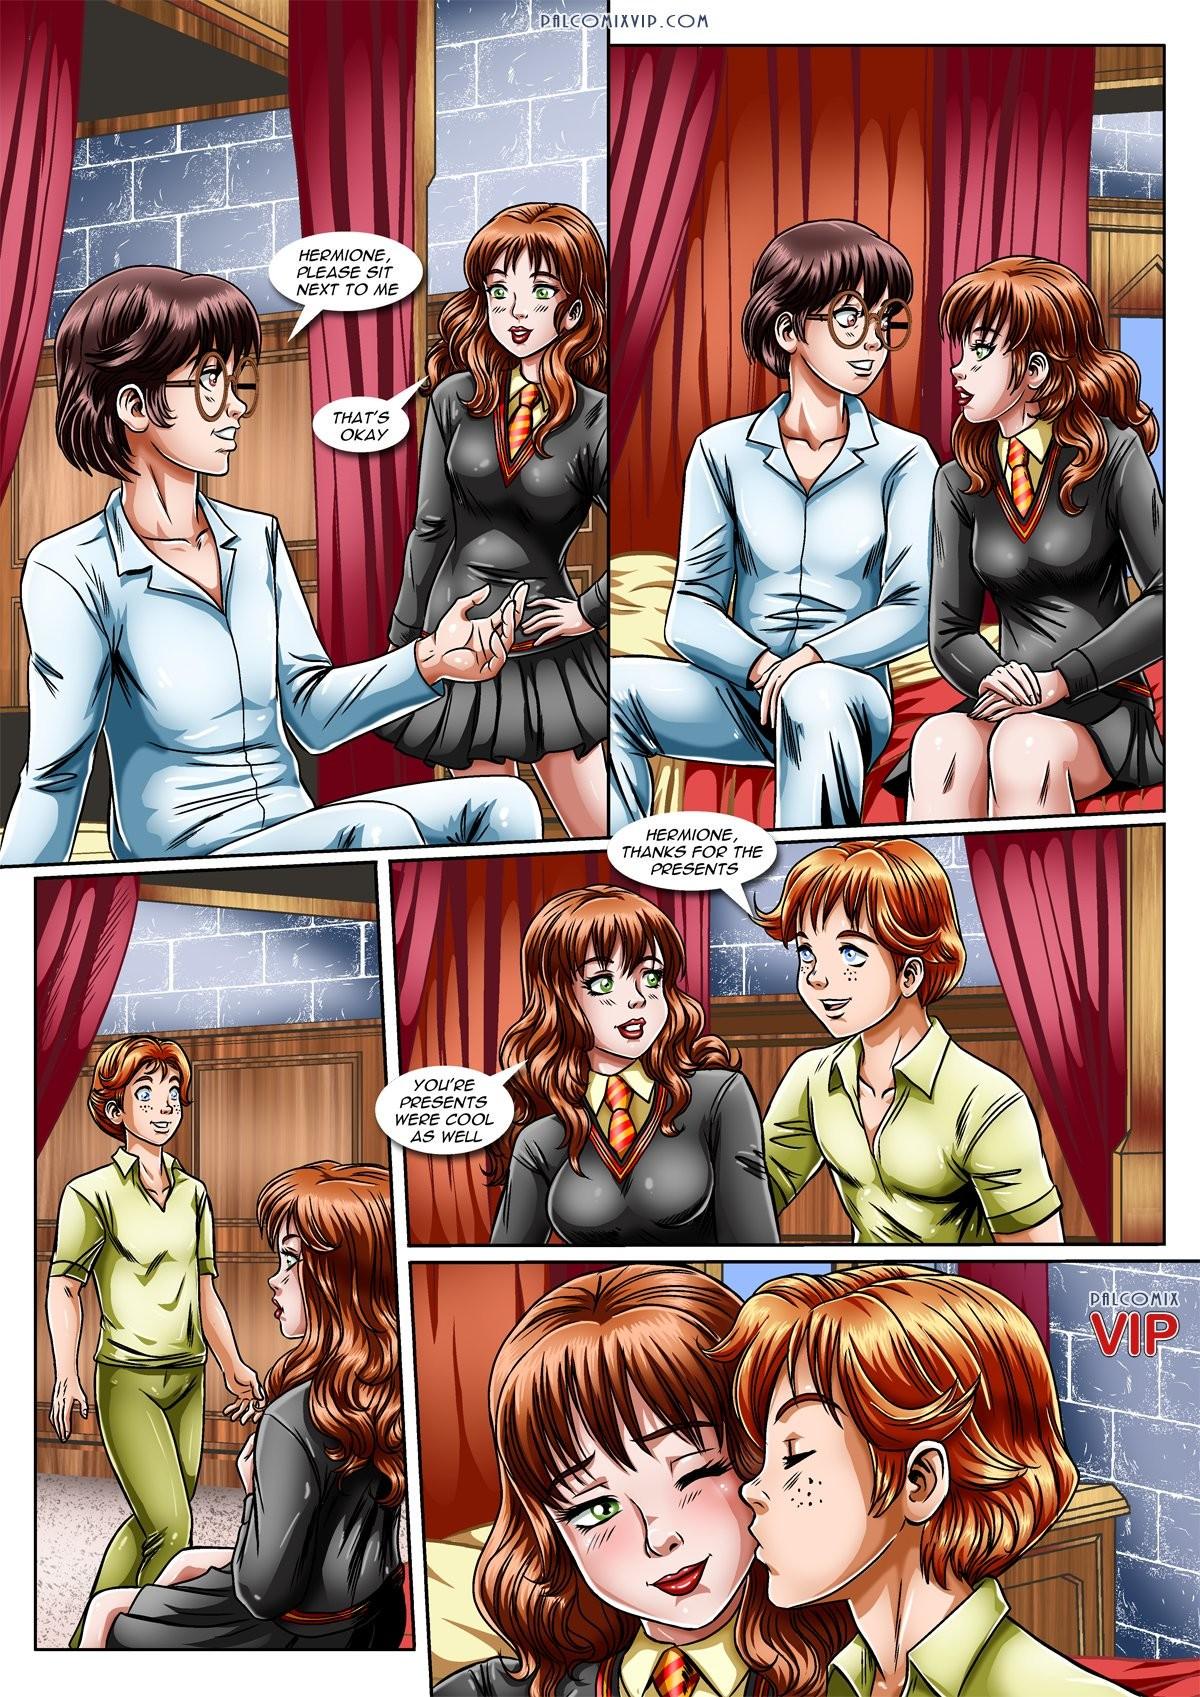 Harry potter sex comic